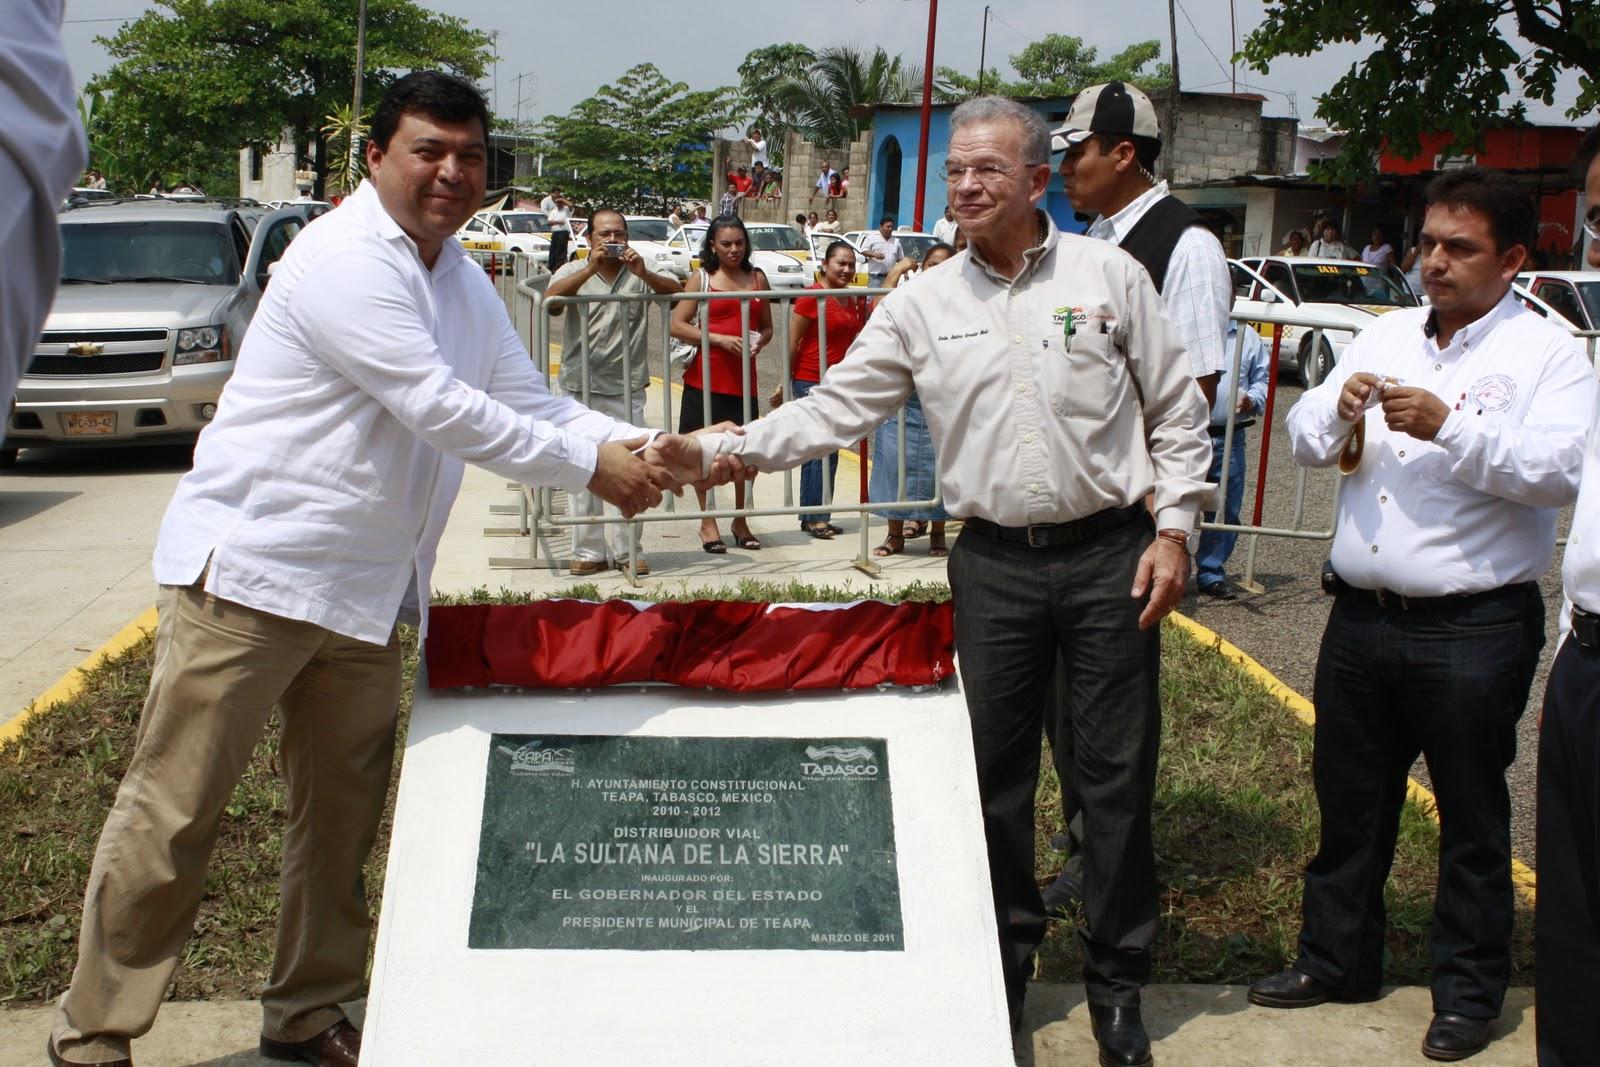 municipio de teapa tabasco: